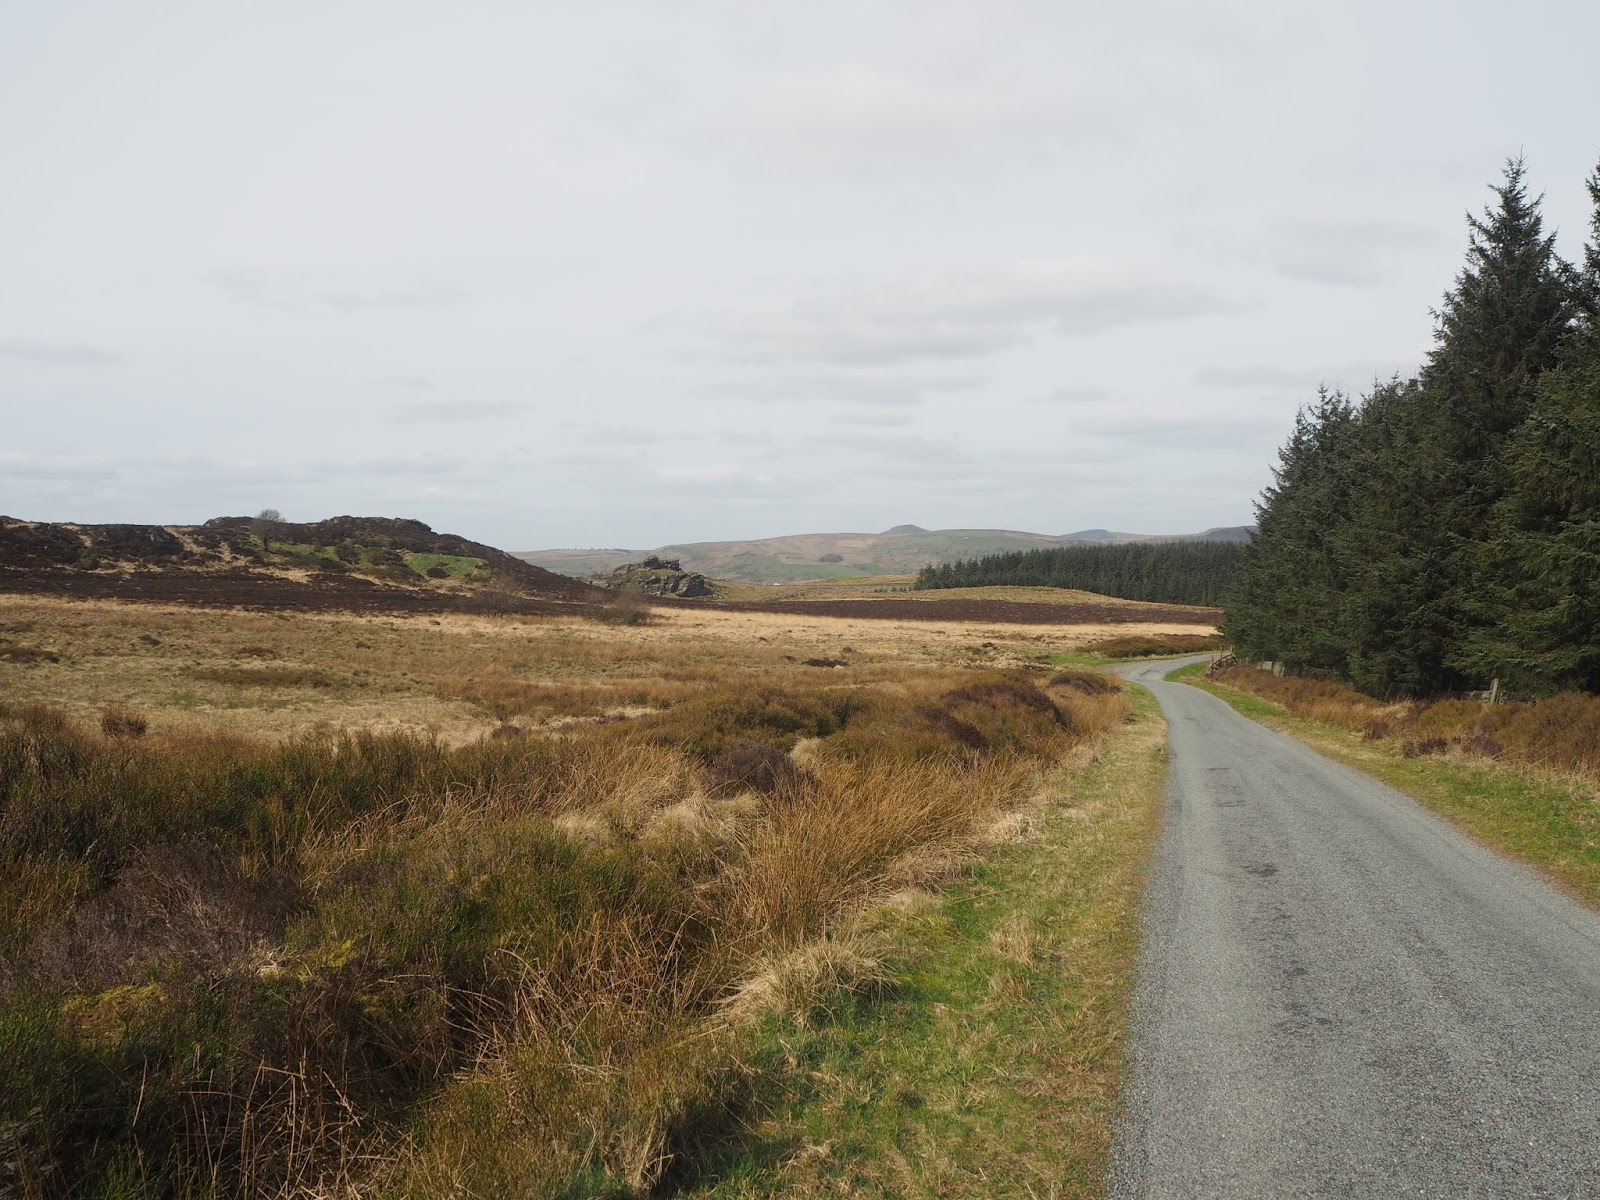 Hen Weekend in the Peak District